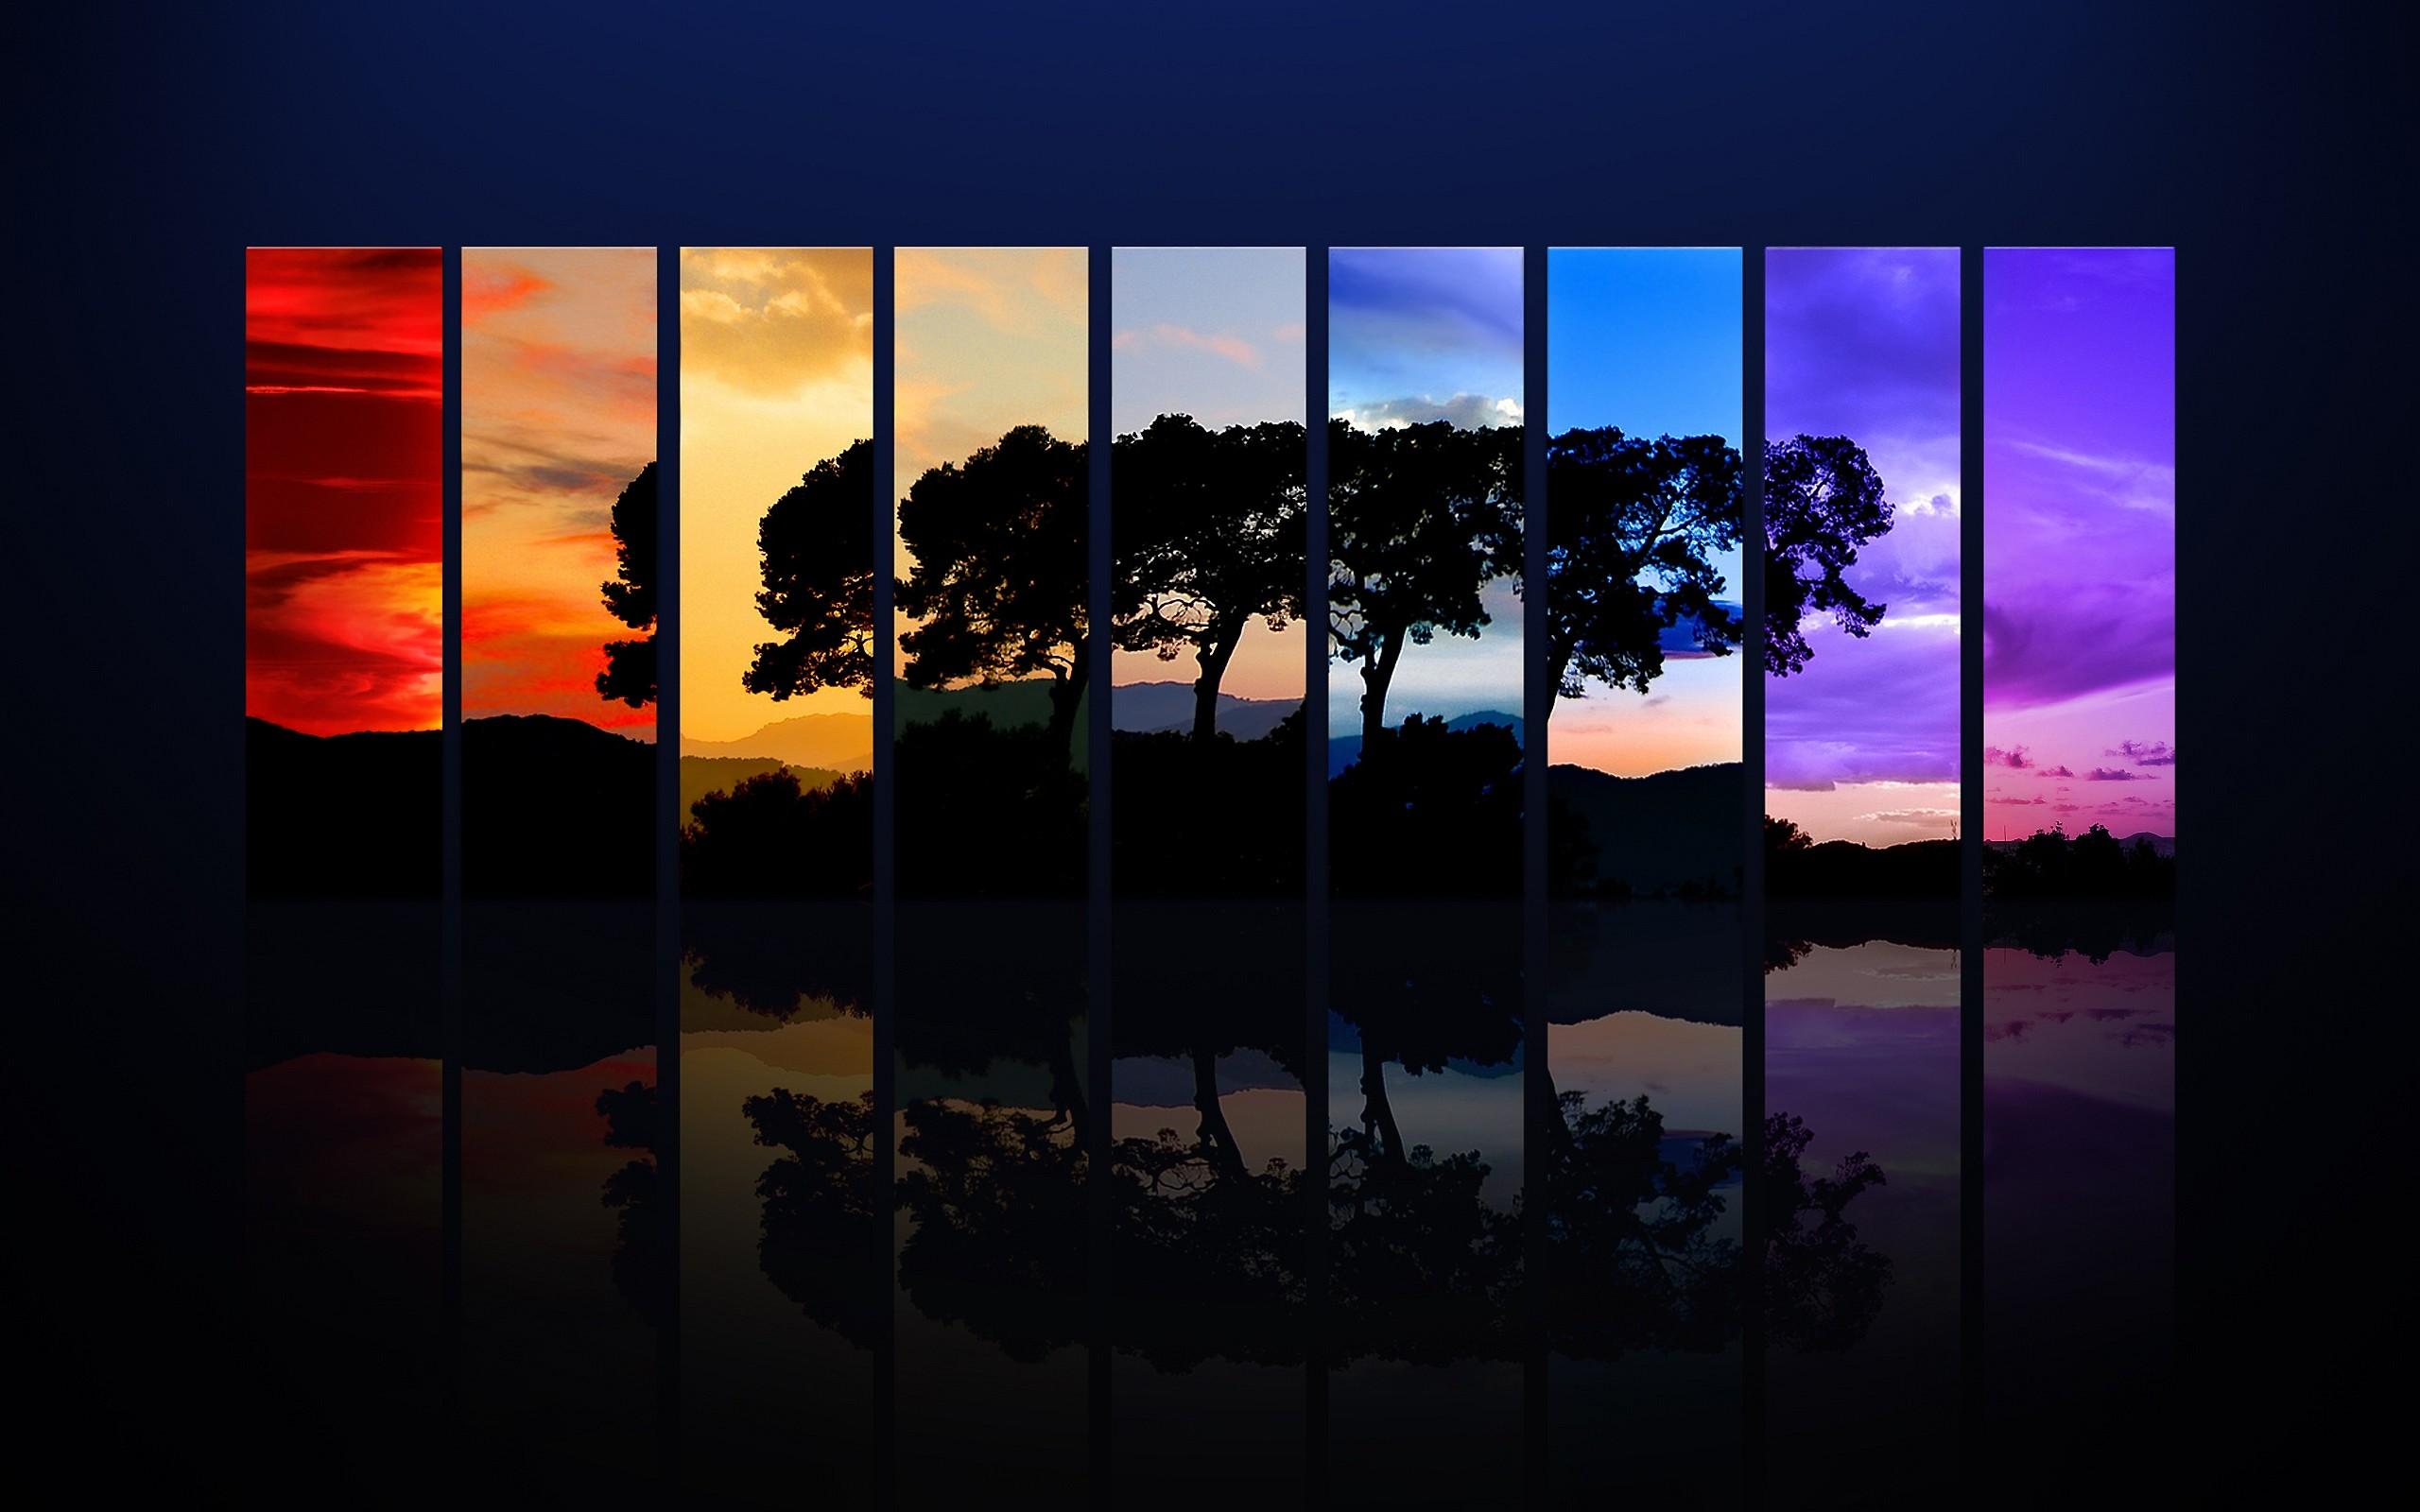 71 Cool Desktop Background Pictures On Wallpapersafari